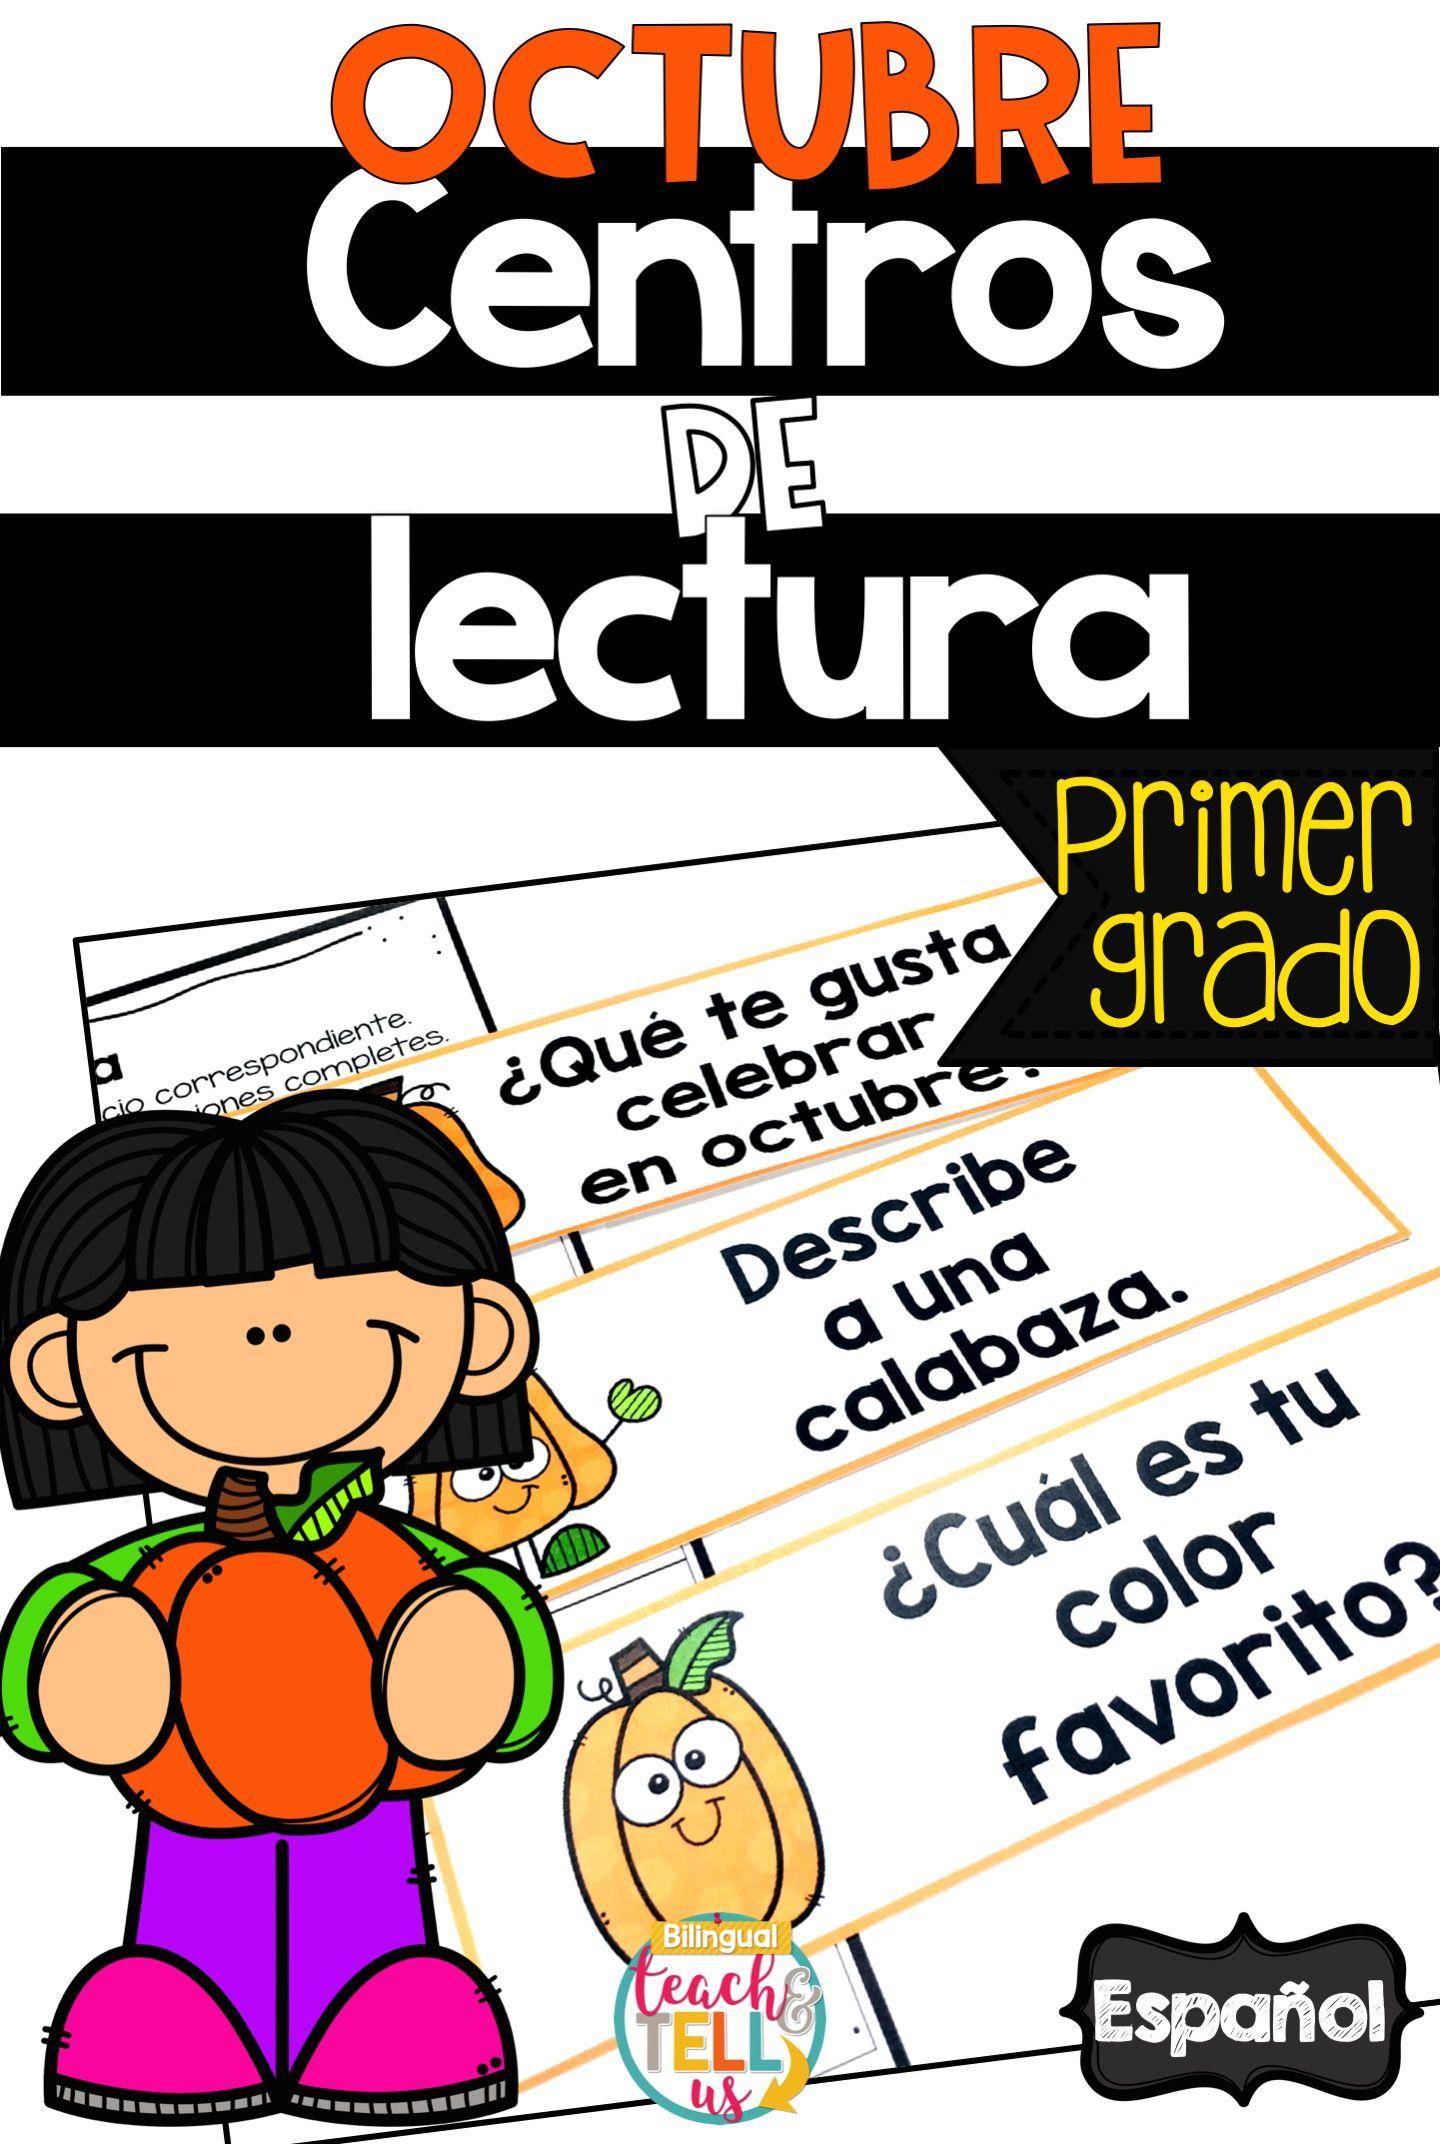 Literacy Centers In Spanish First Grade Centros De Lectura Primer Grado Dual Language Classroom Spanish Writing Literacy Centers [ 2144 x 1440 Pixel ]